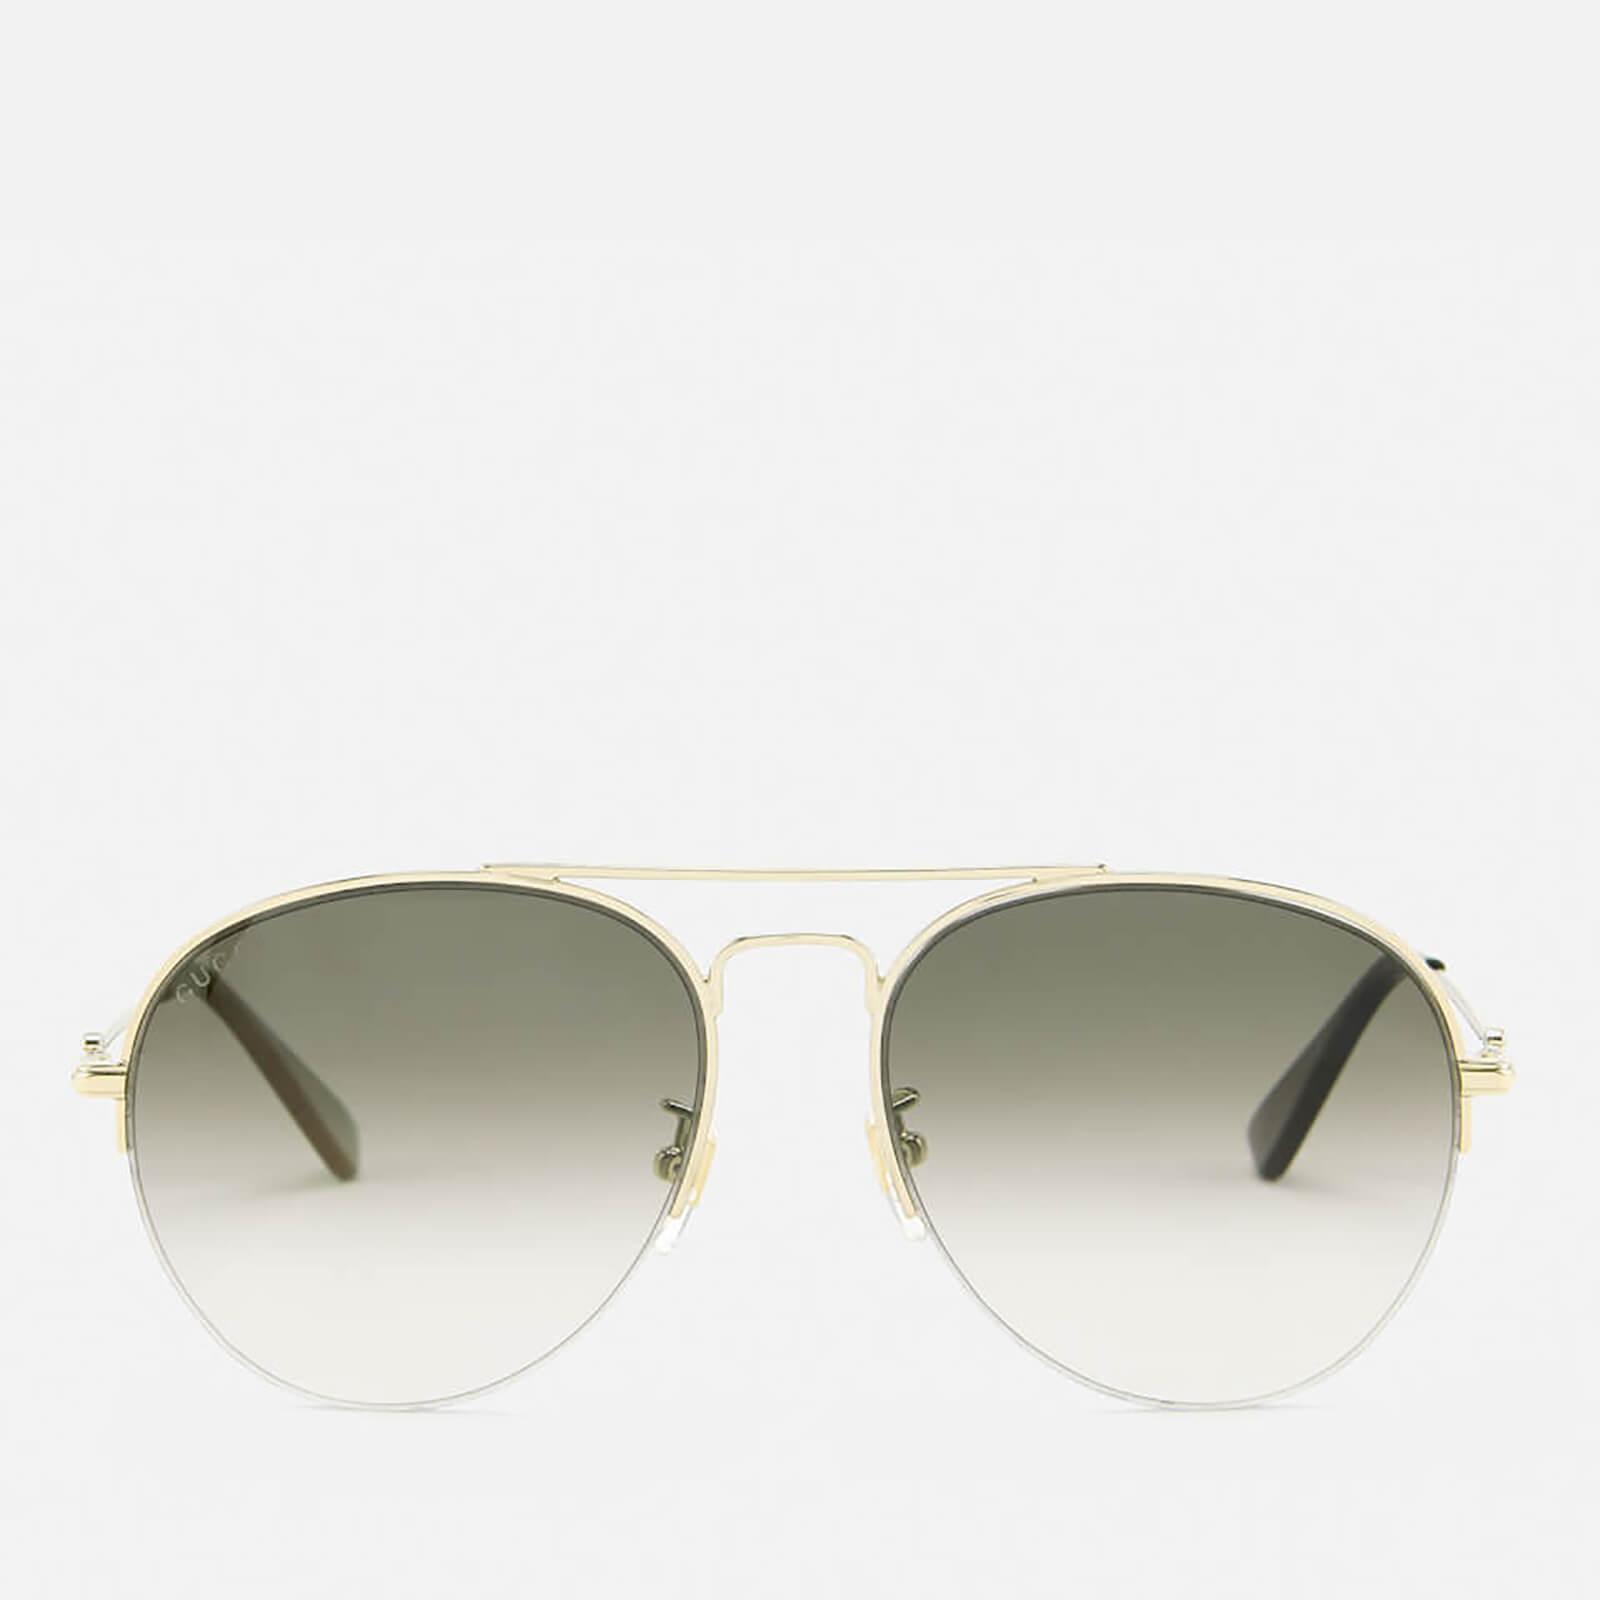 Gucci Women S Aviator Sunglasses Gold Brown